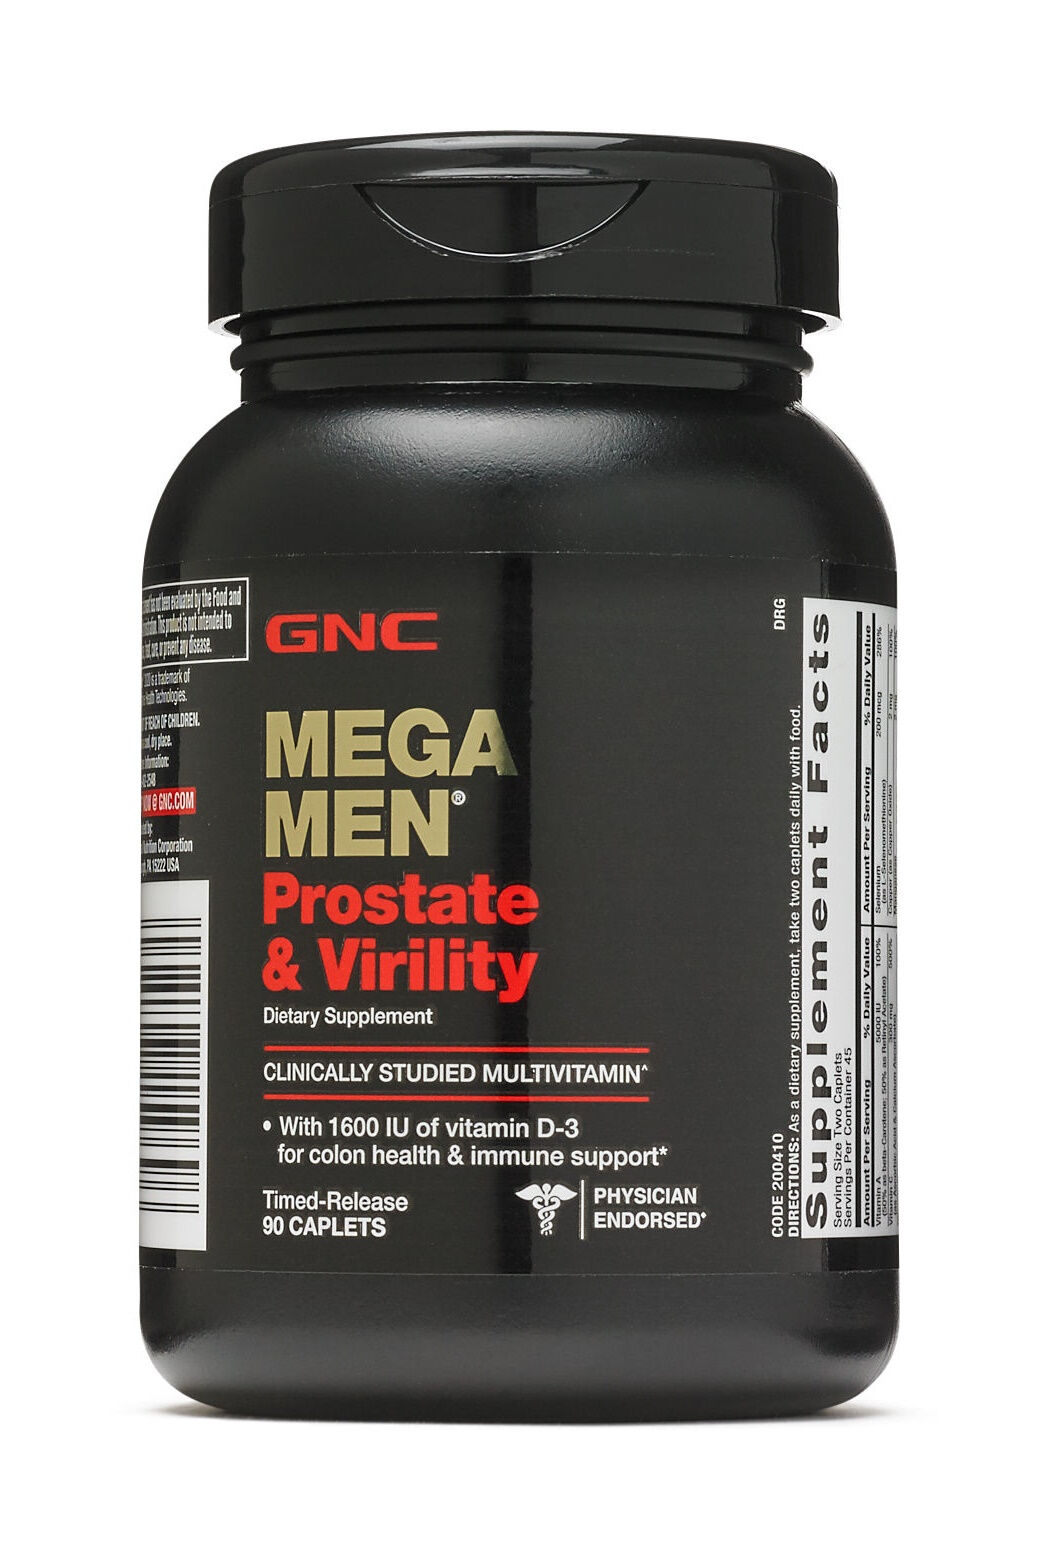 Купить New GNC Mega Men Prostate and Virility 90 Caplets Free Shipping EXP 03/2020